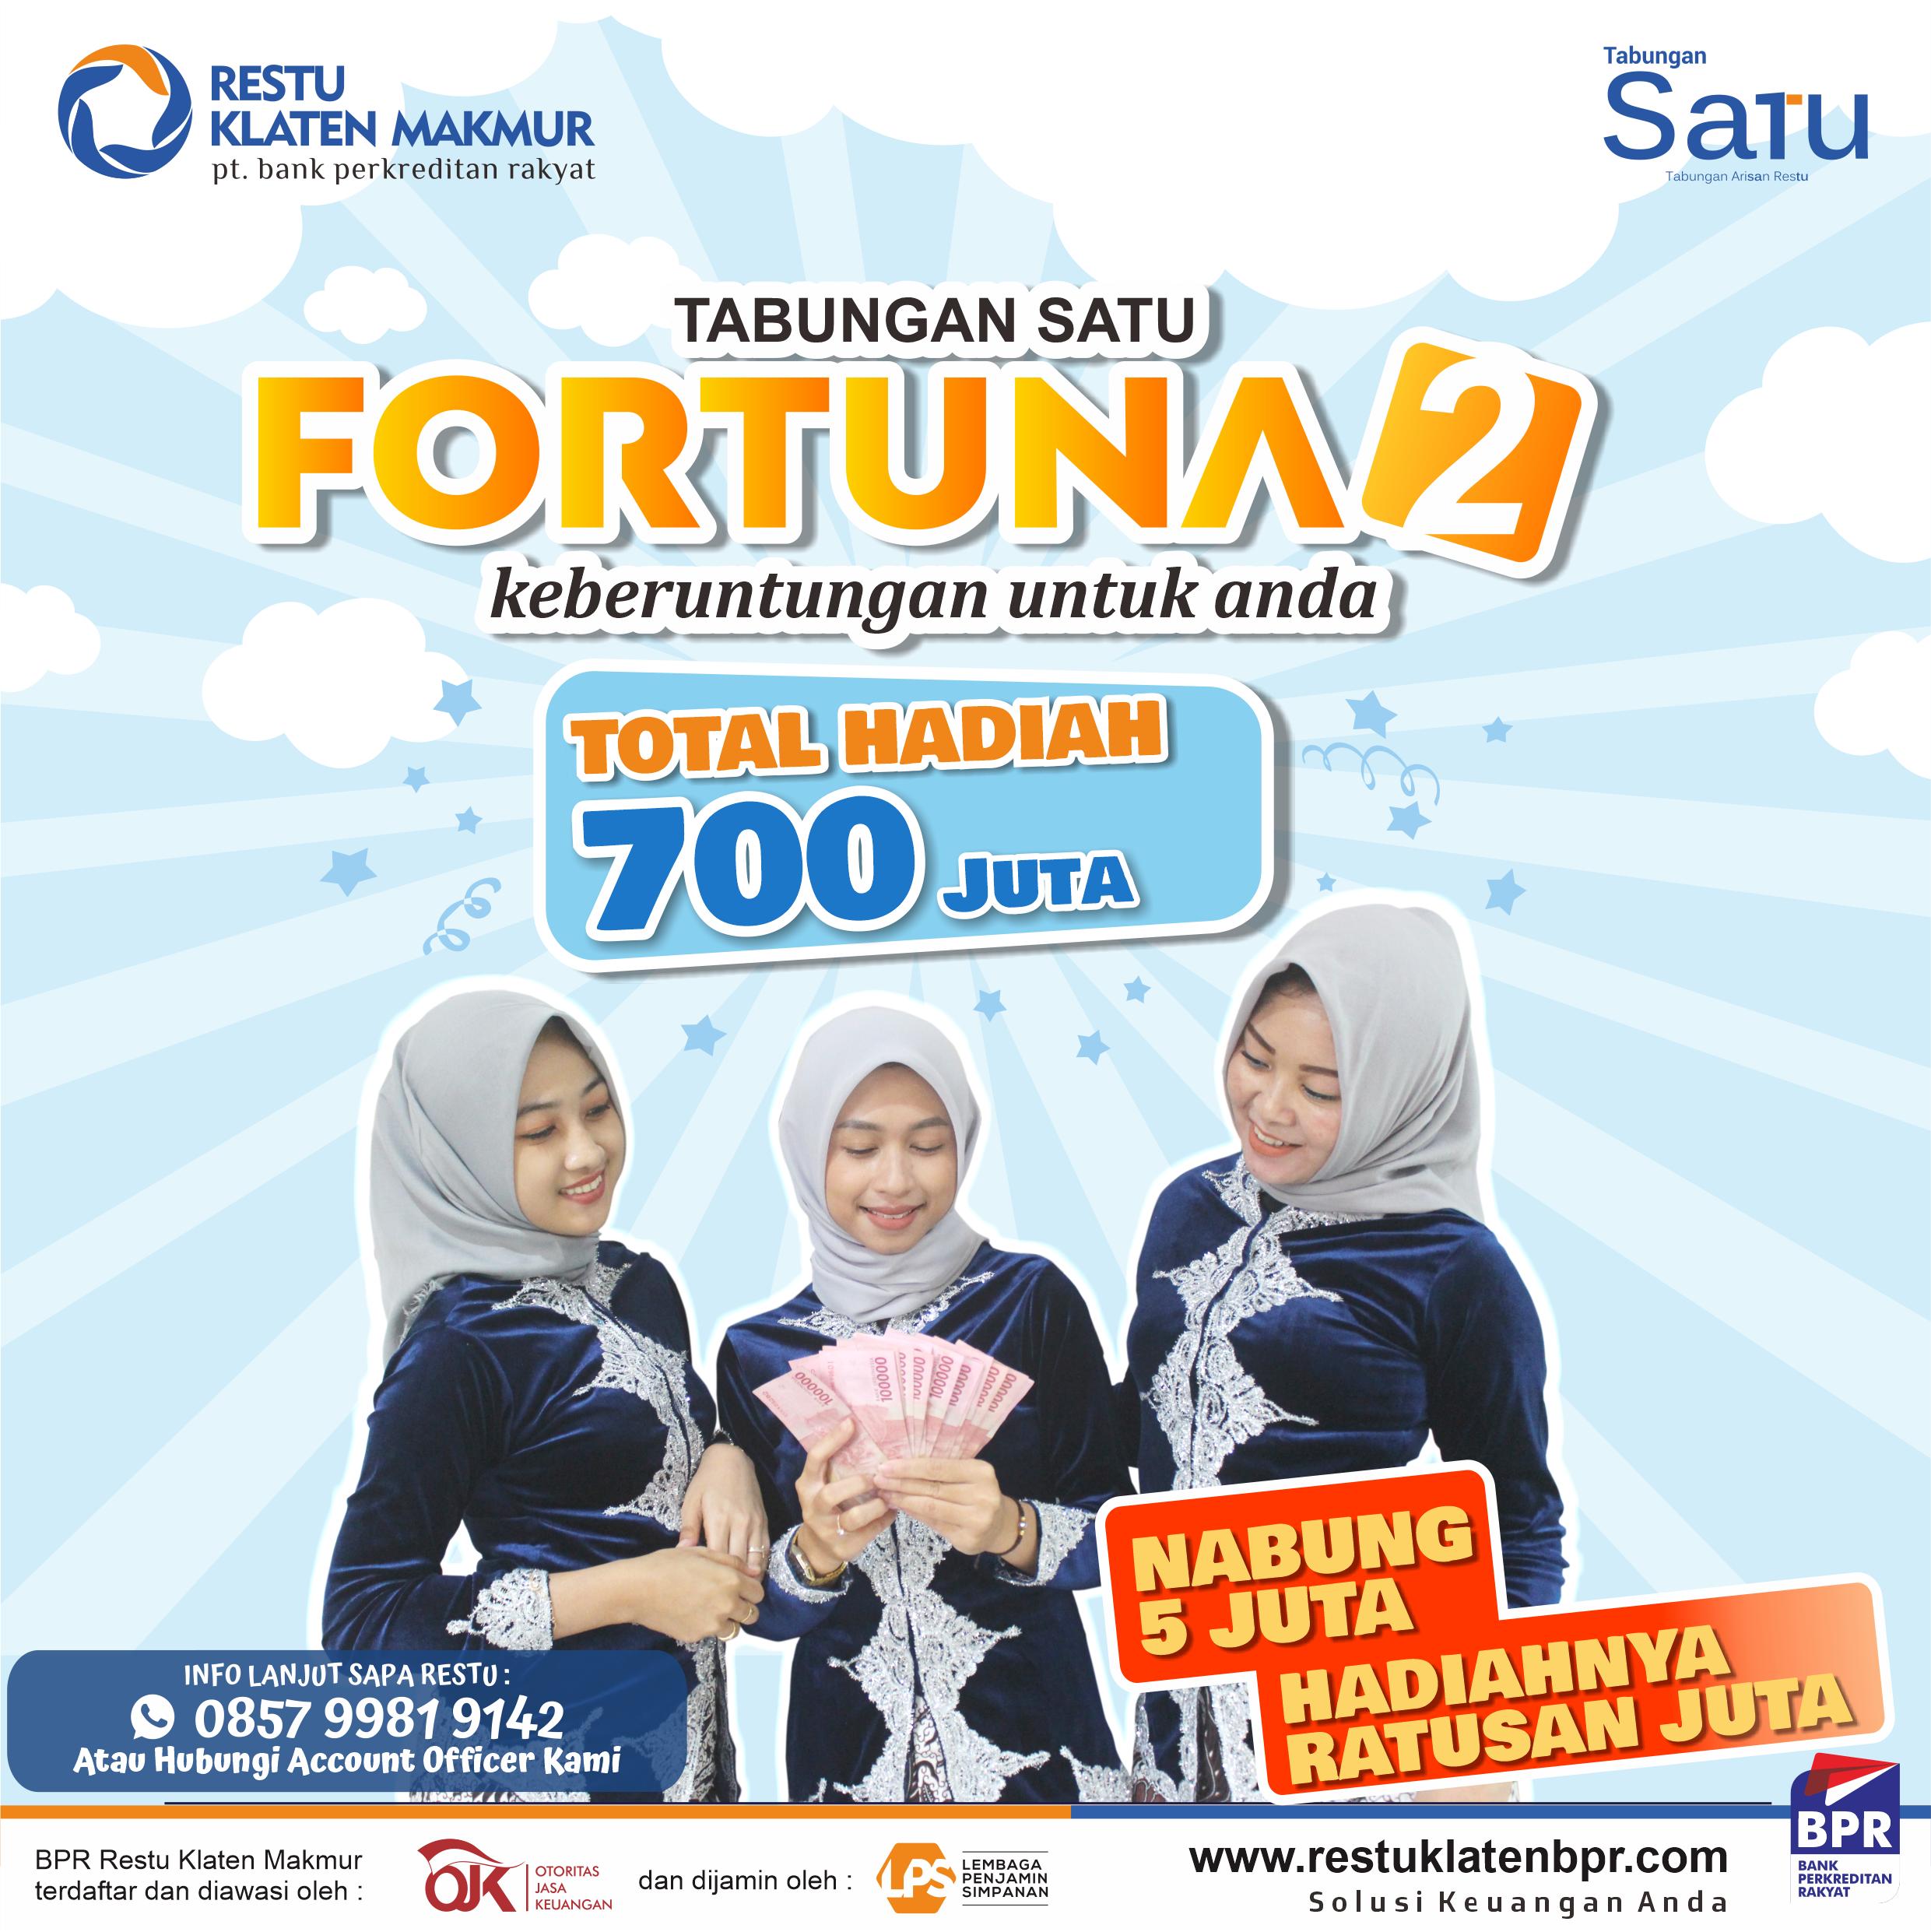 Tabungan Fortuna 2